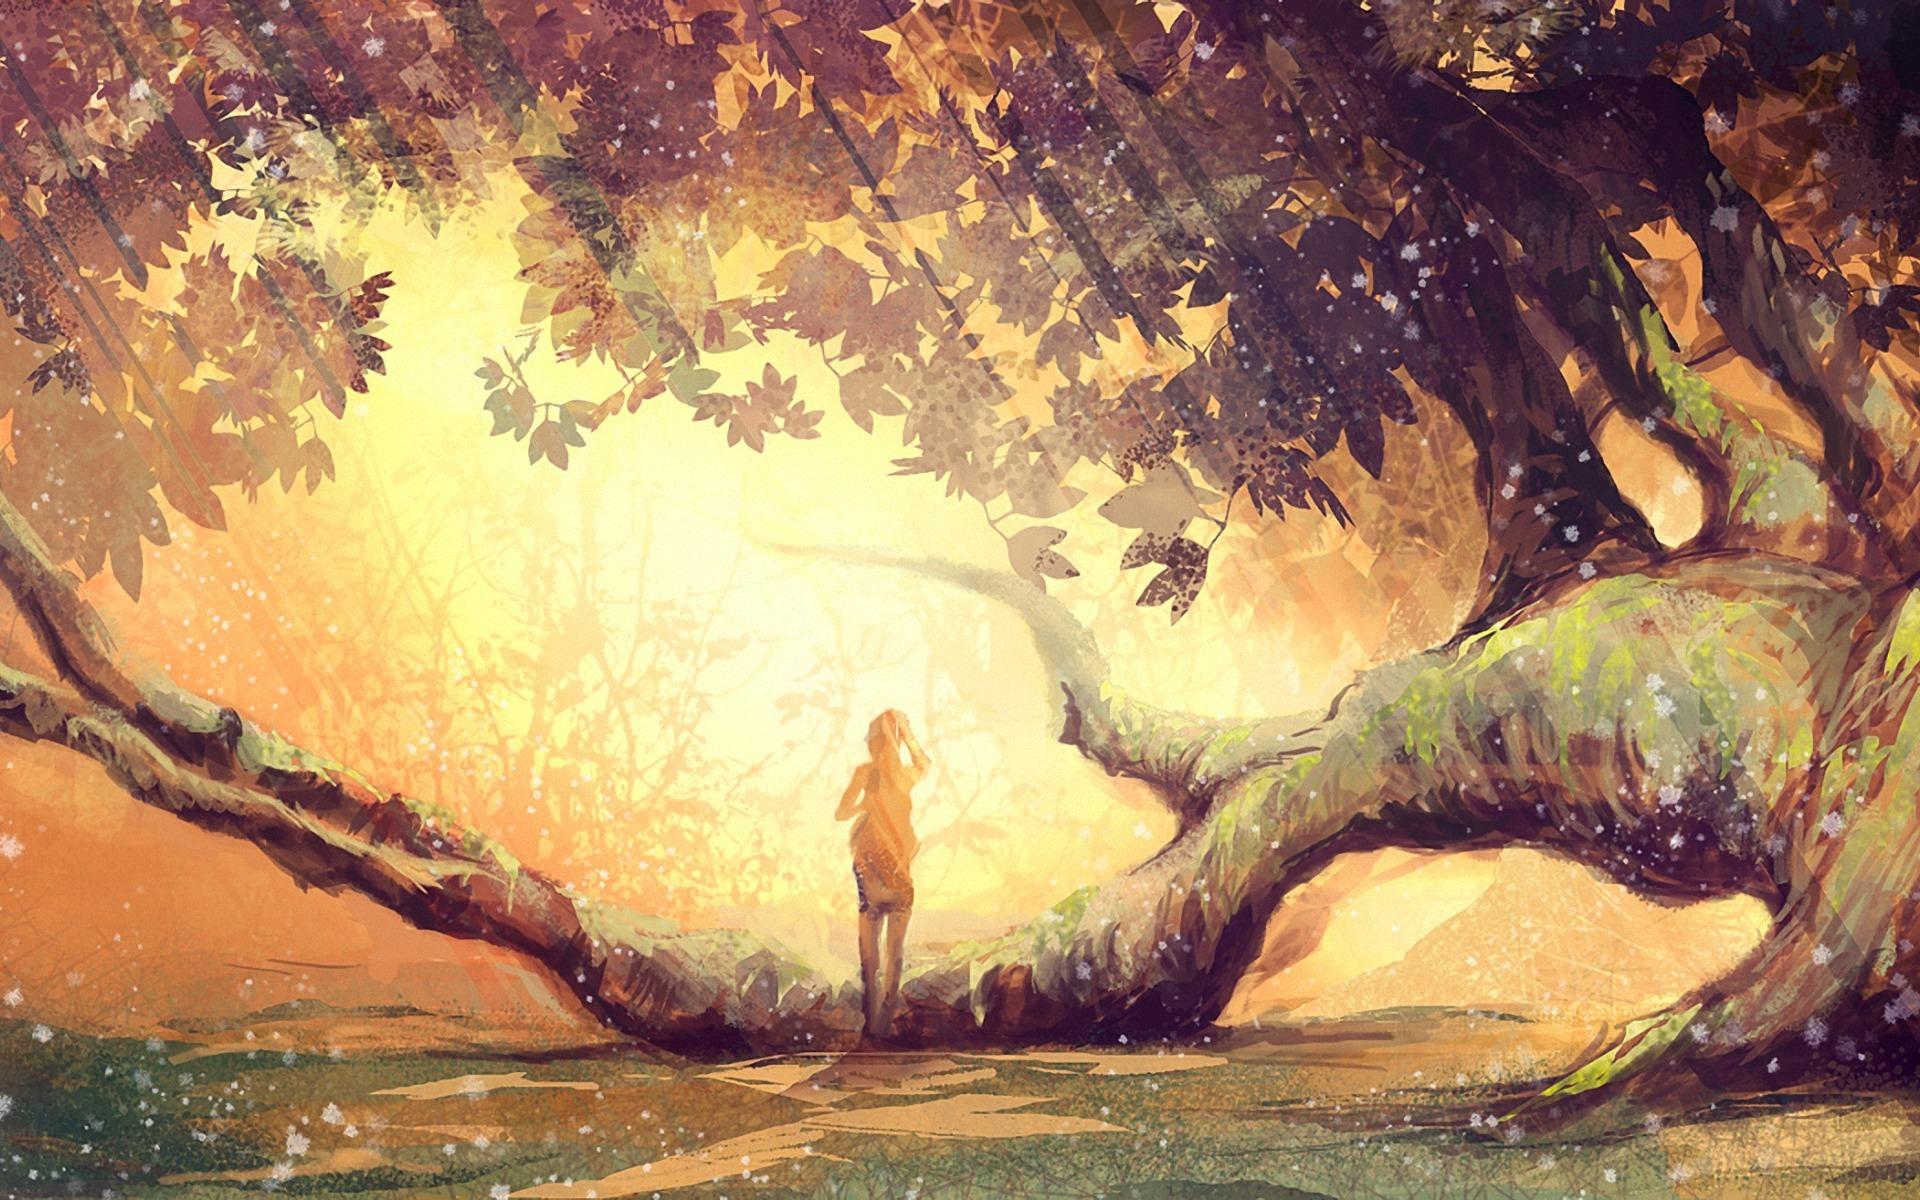 Девушка дерево улыбка лес Girl tree smile forest загрузить